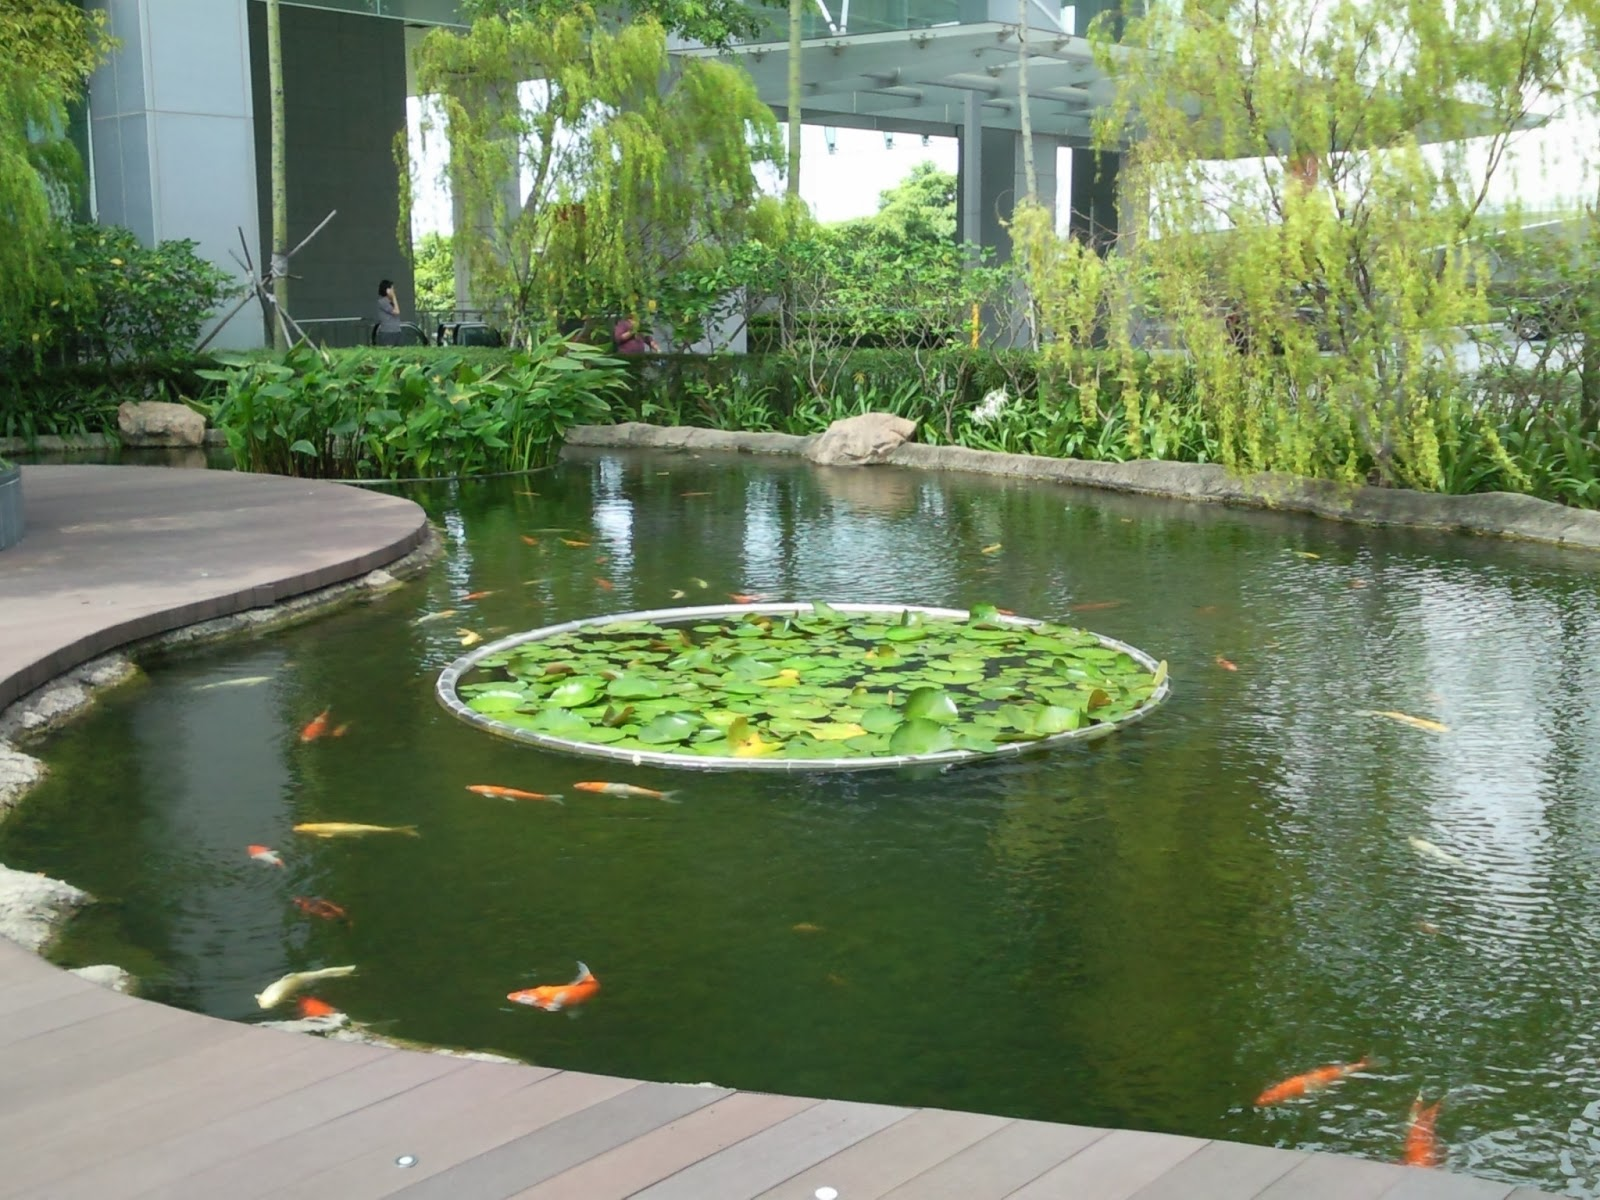 Tropical fisher man fish tanks and aquarium crs koi pond for Koi pond quezon city